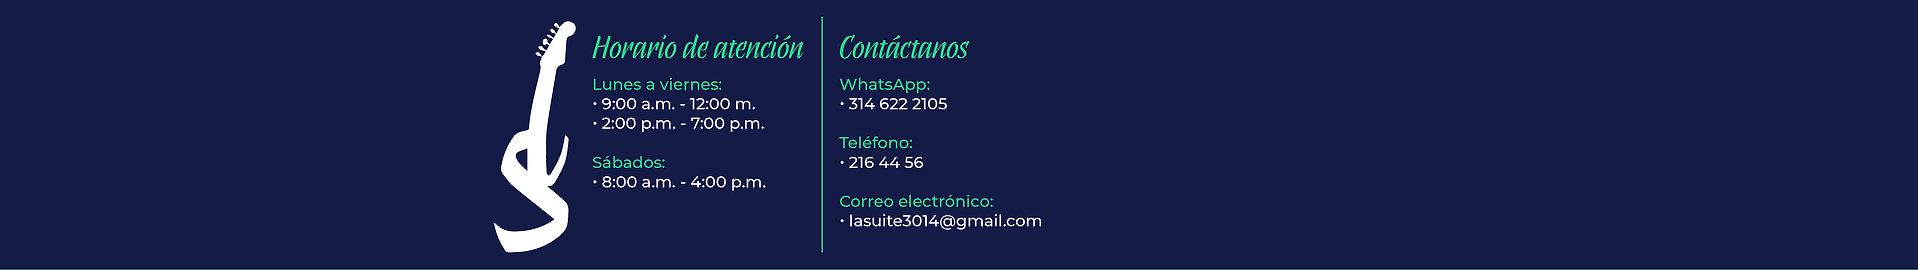 PATA-SITIO-WEB-14.jpg